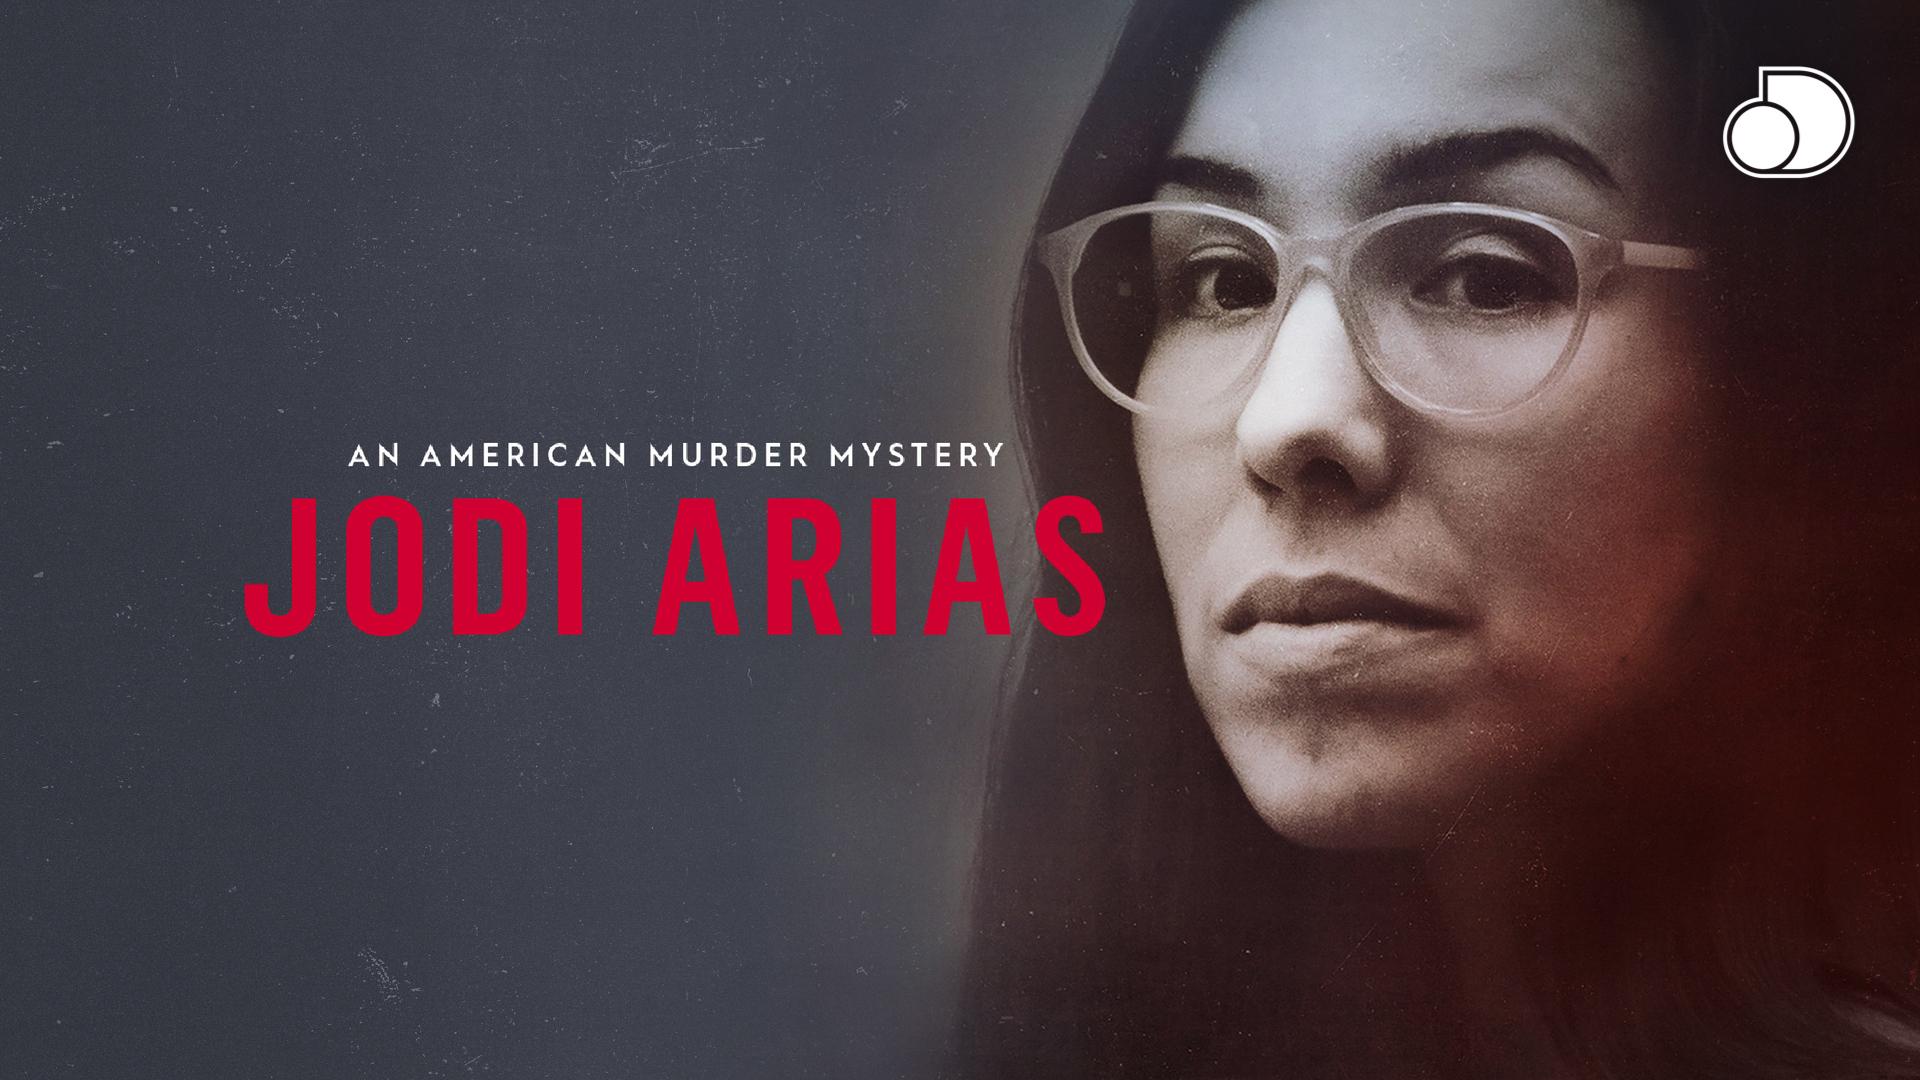 Jodi Arias: An American Murder Mystery - Season 1